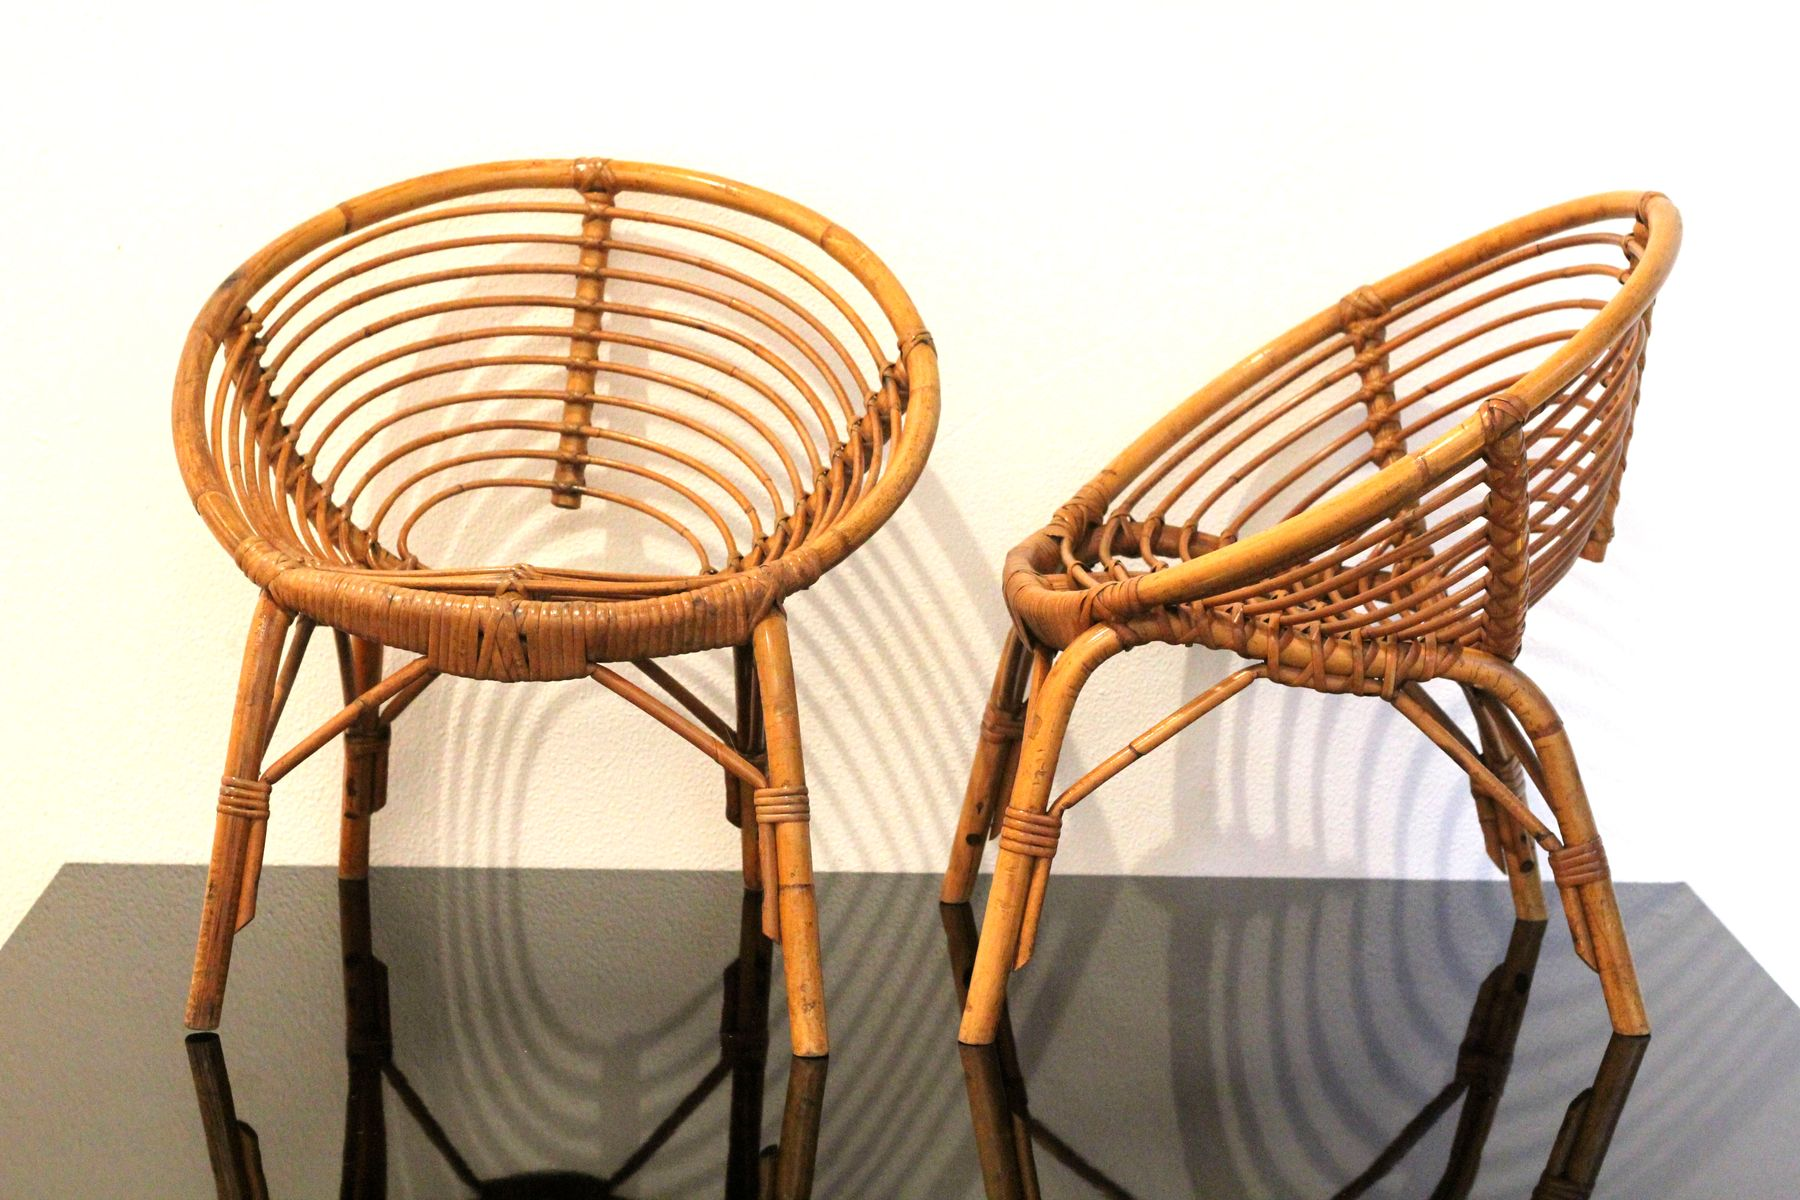 Vintage kinderstuhl aus rattan 1960er bei pamono kaufen - Kinderstuhl vintage ...